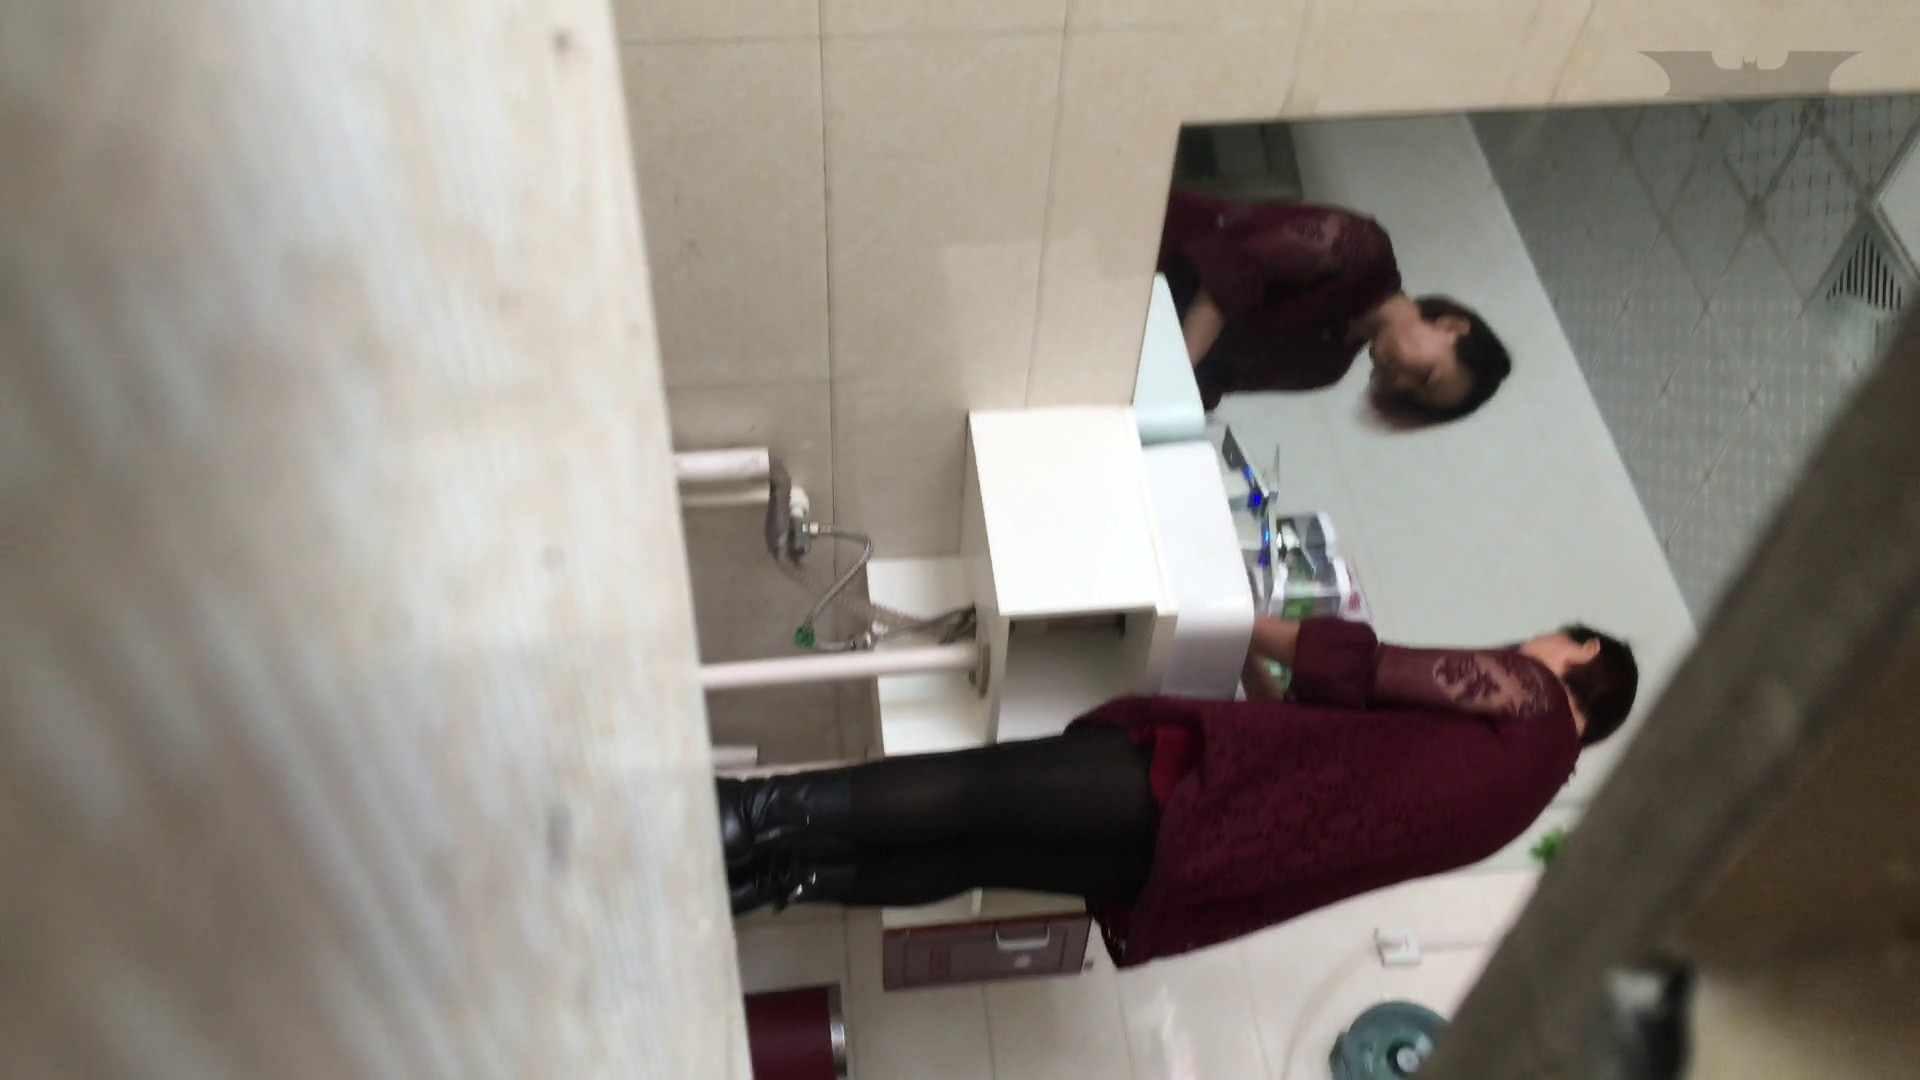 芸術大学ガチ潜入盗撮 JD盗撮 美女の洗面所の秘密 Vol.111 美肌 ワレメ無修正動画無料 96画像 32